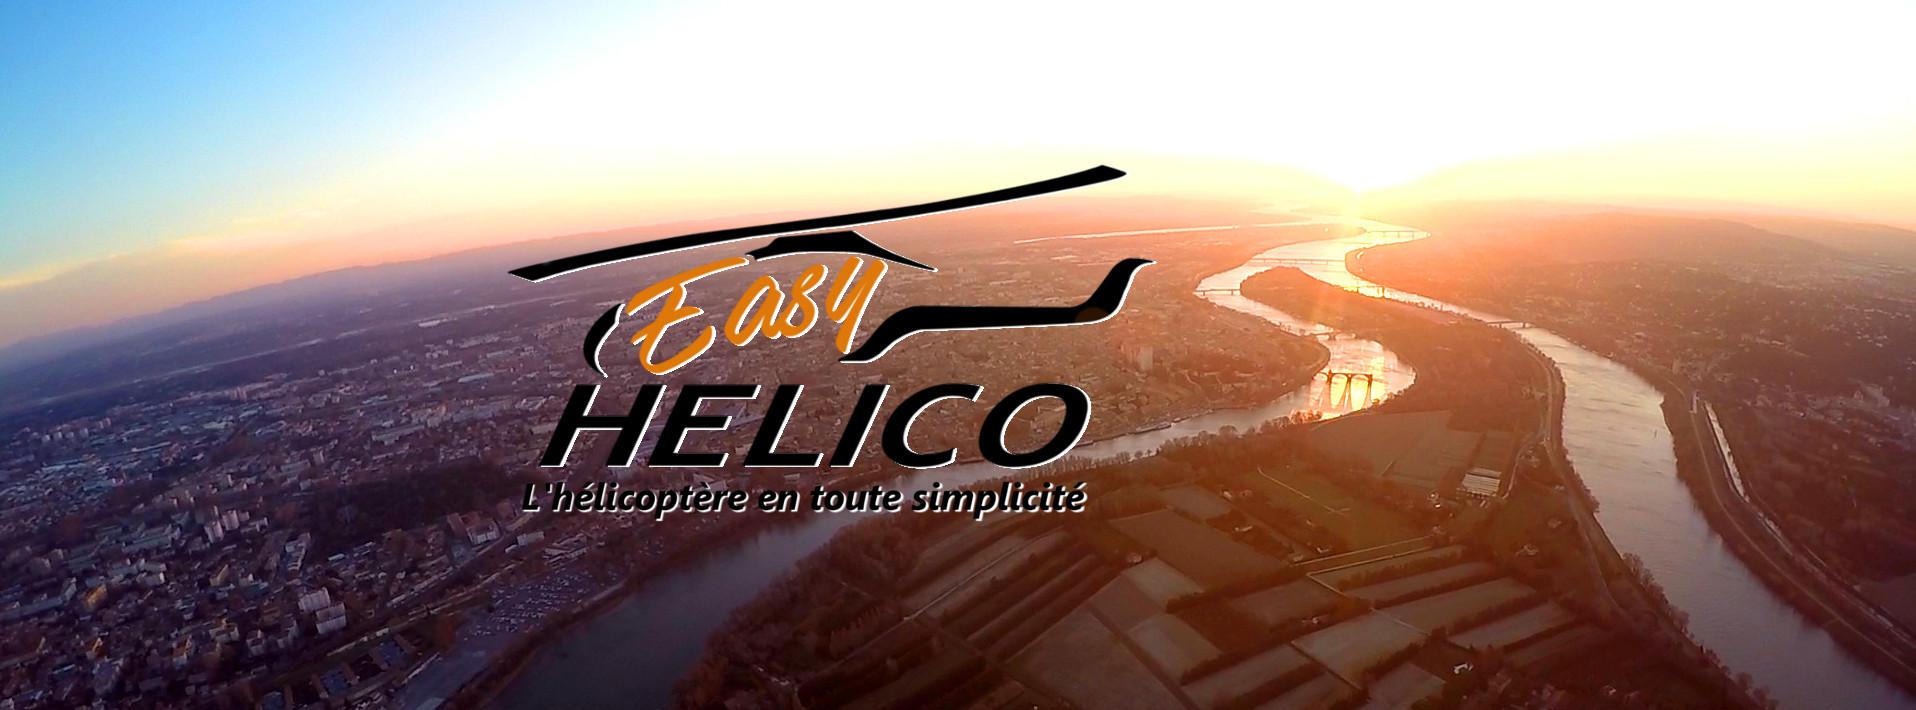 Easy Helico couché de soleil